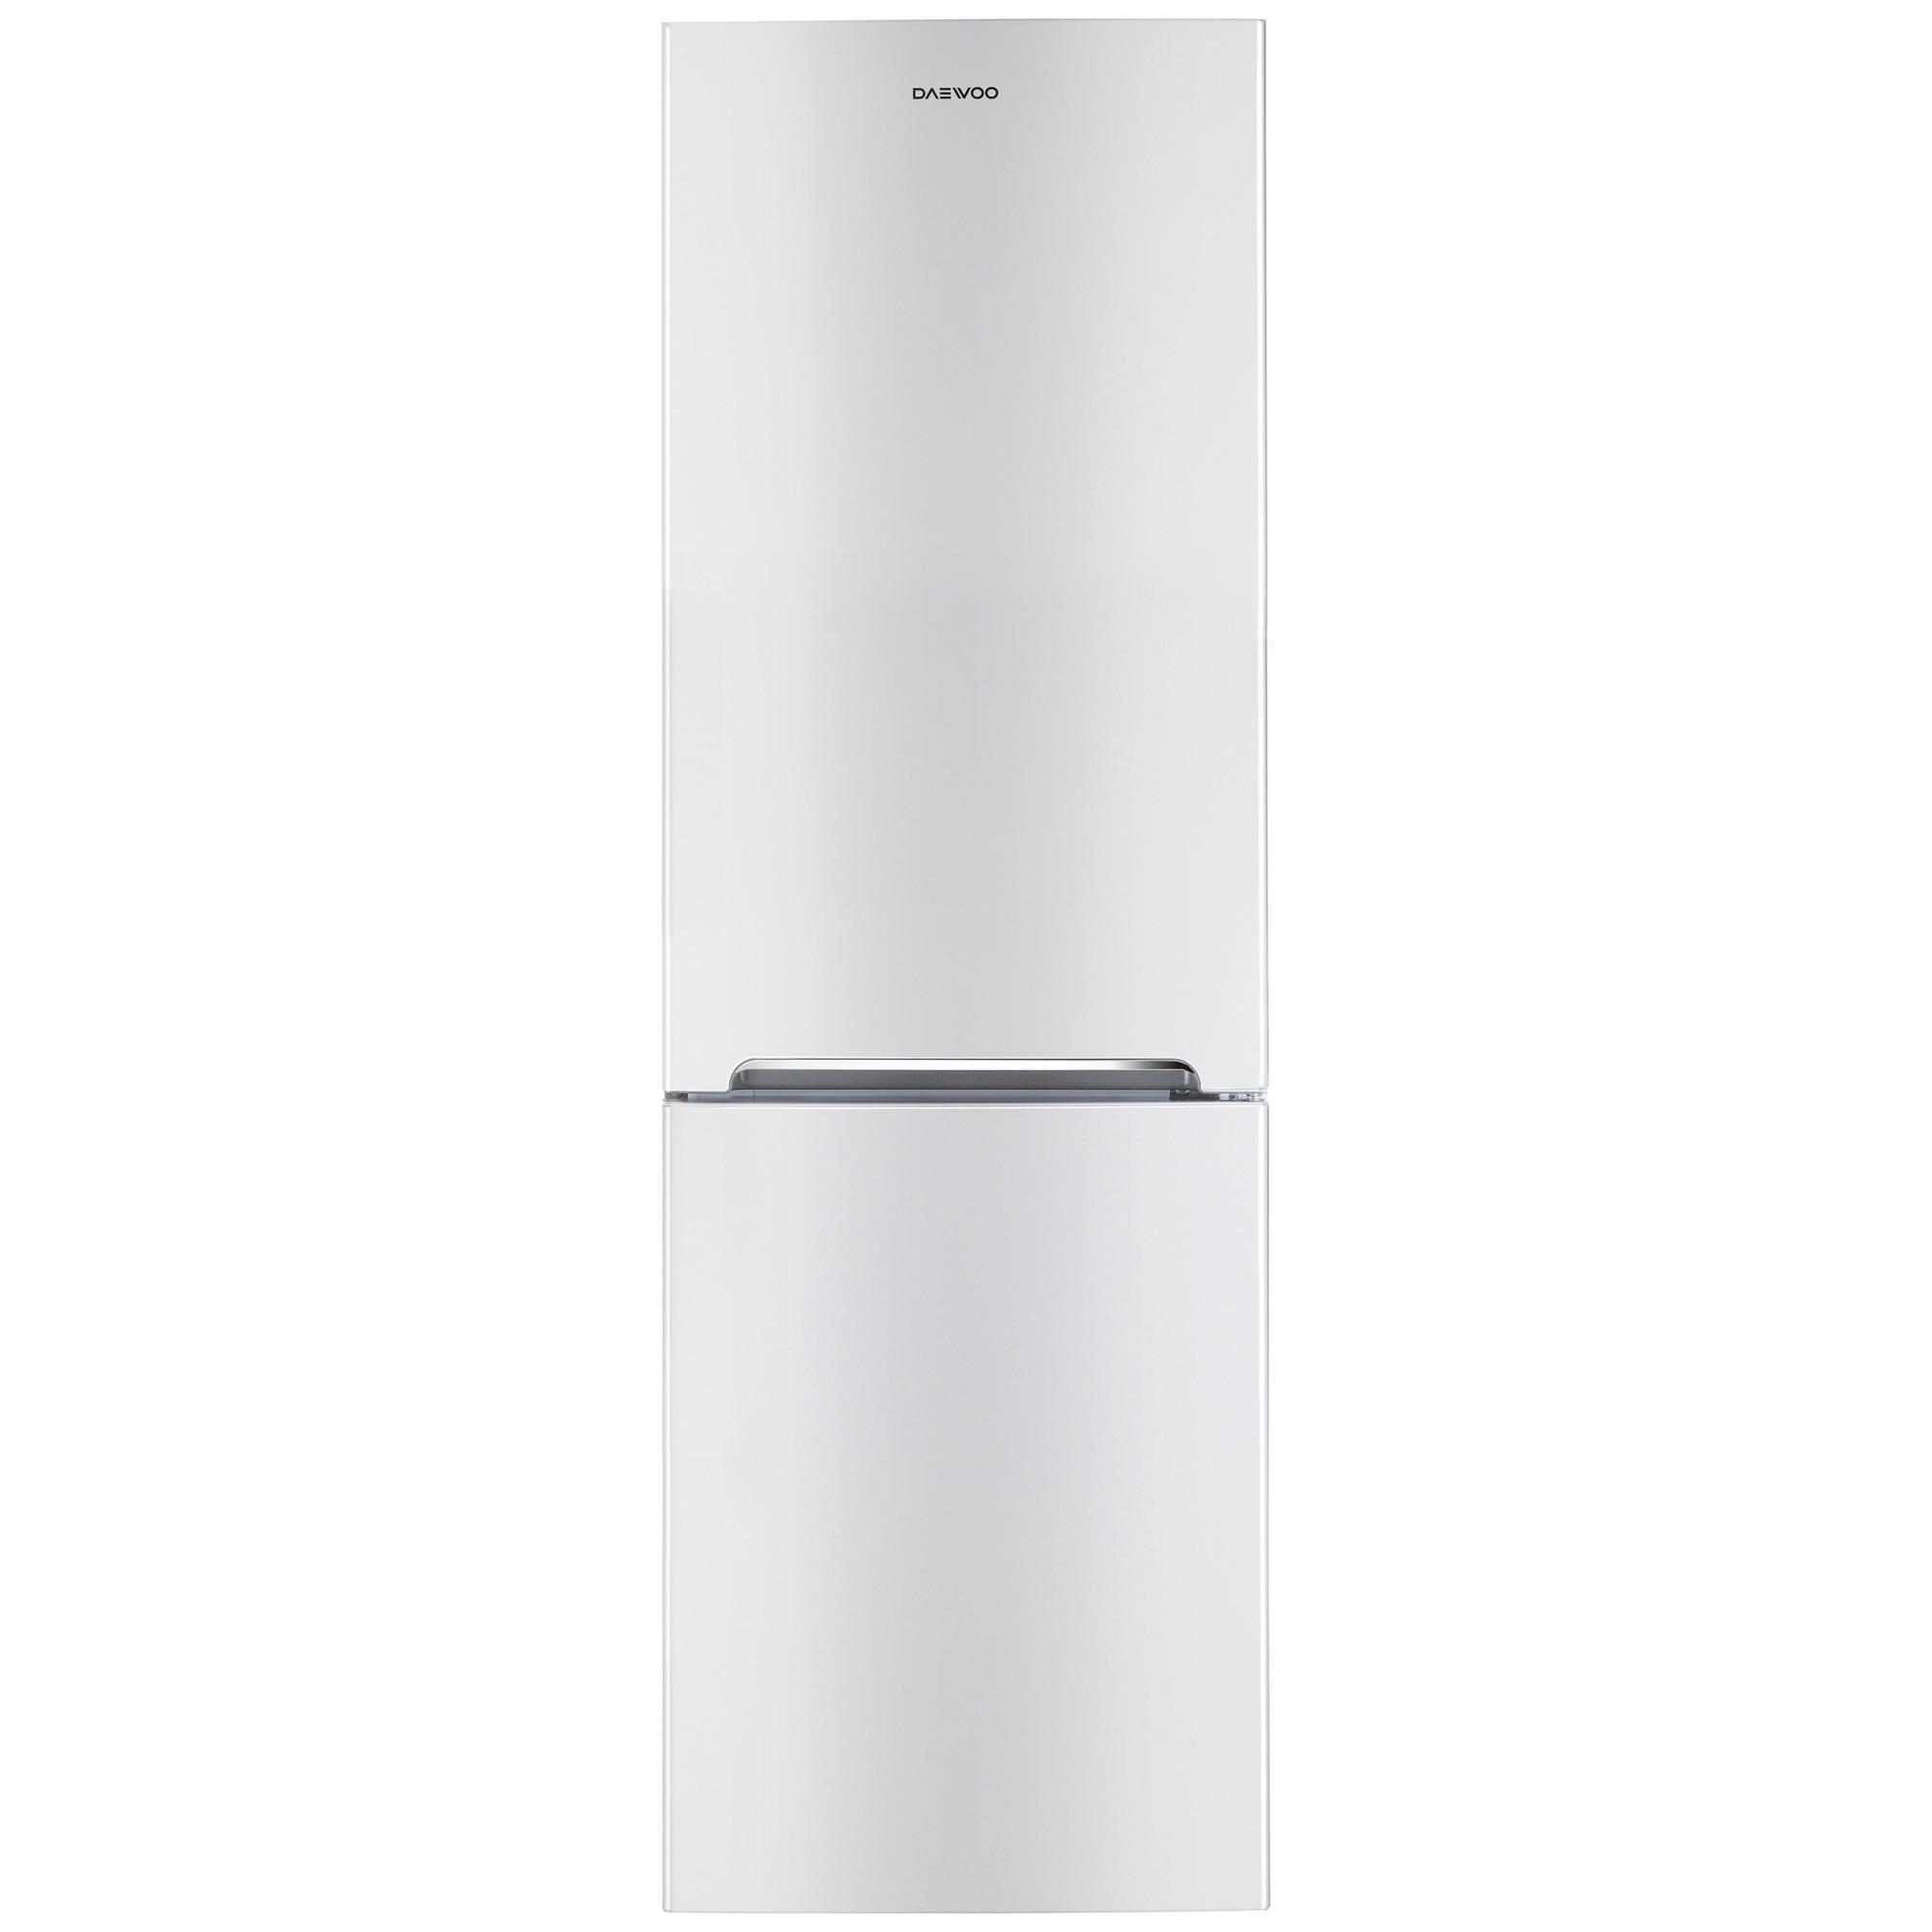 Fotografie Combina frigorifica Daewoo RN-309RDQW, 305 l, Clasa A+, Full No Frost, Iluminare LED, H 187 cm, Alb